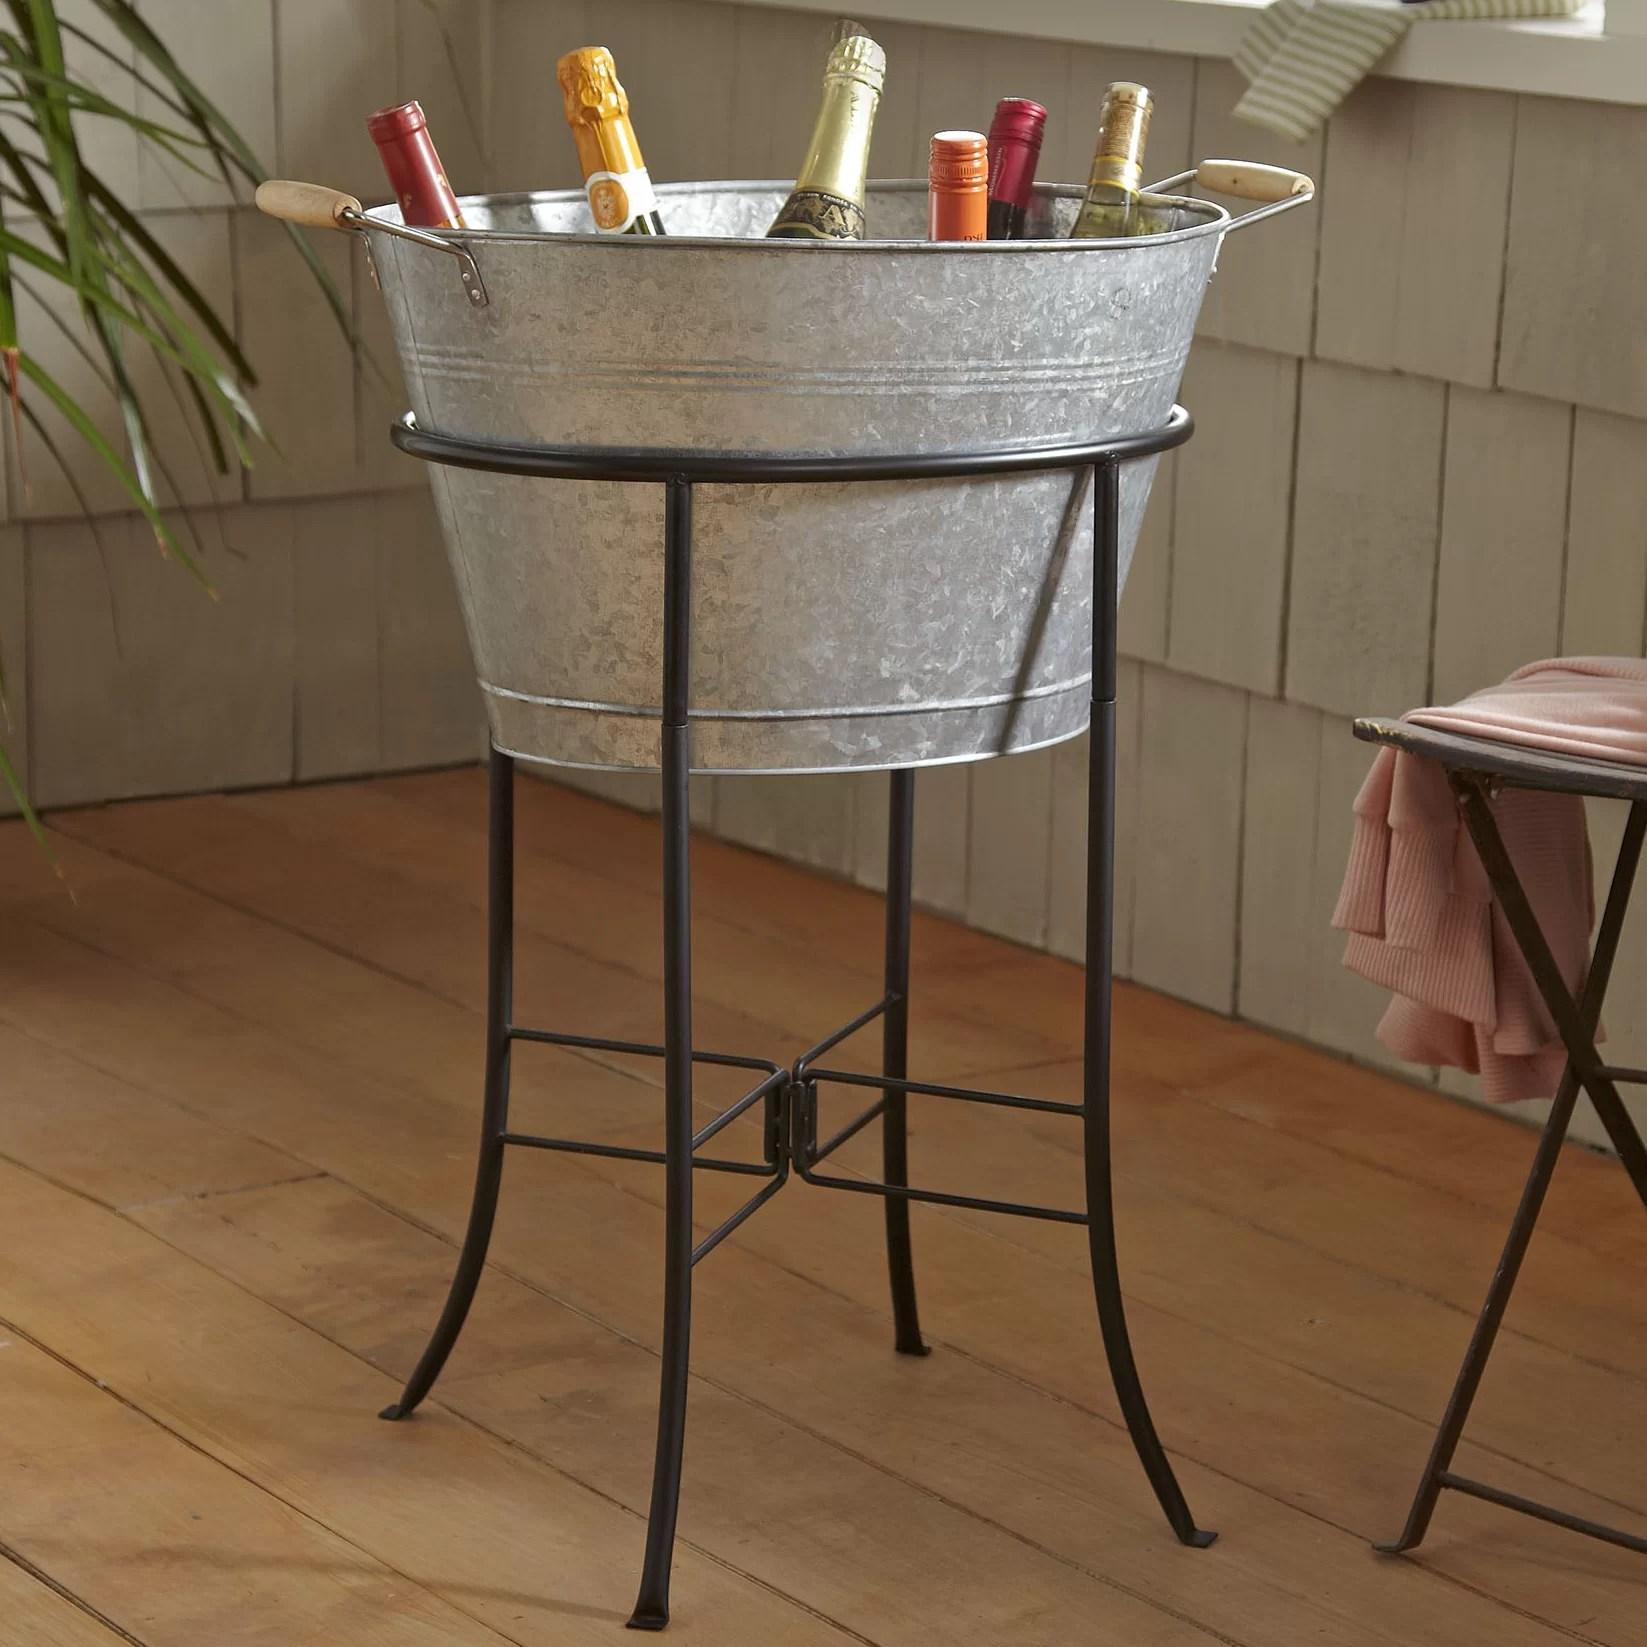 Hoyleton Beverage Tub With Stand Reviews Birch Lane